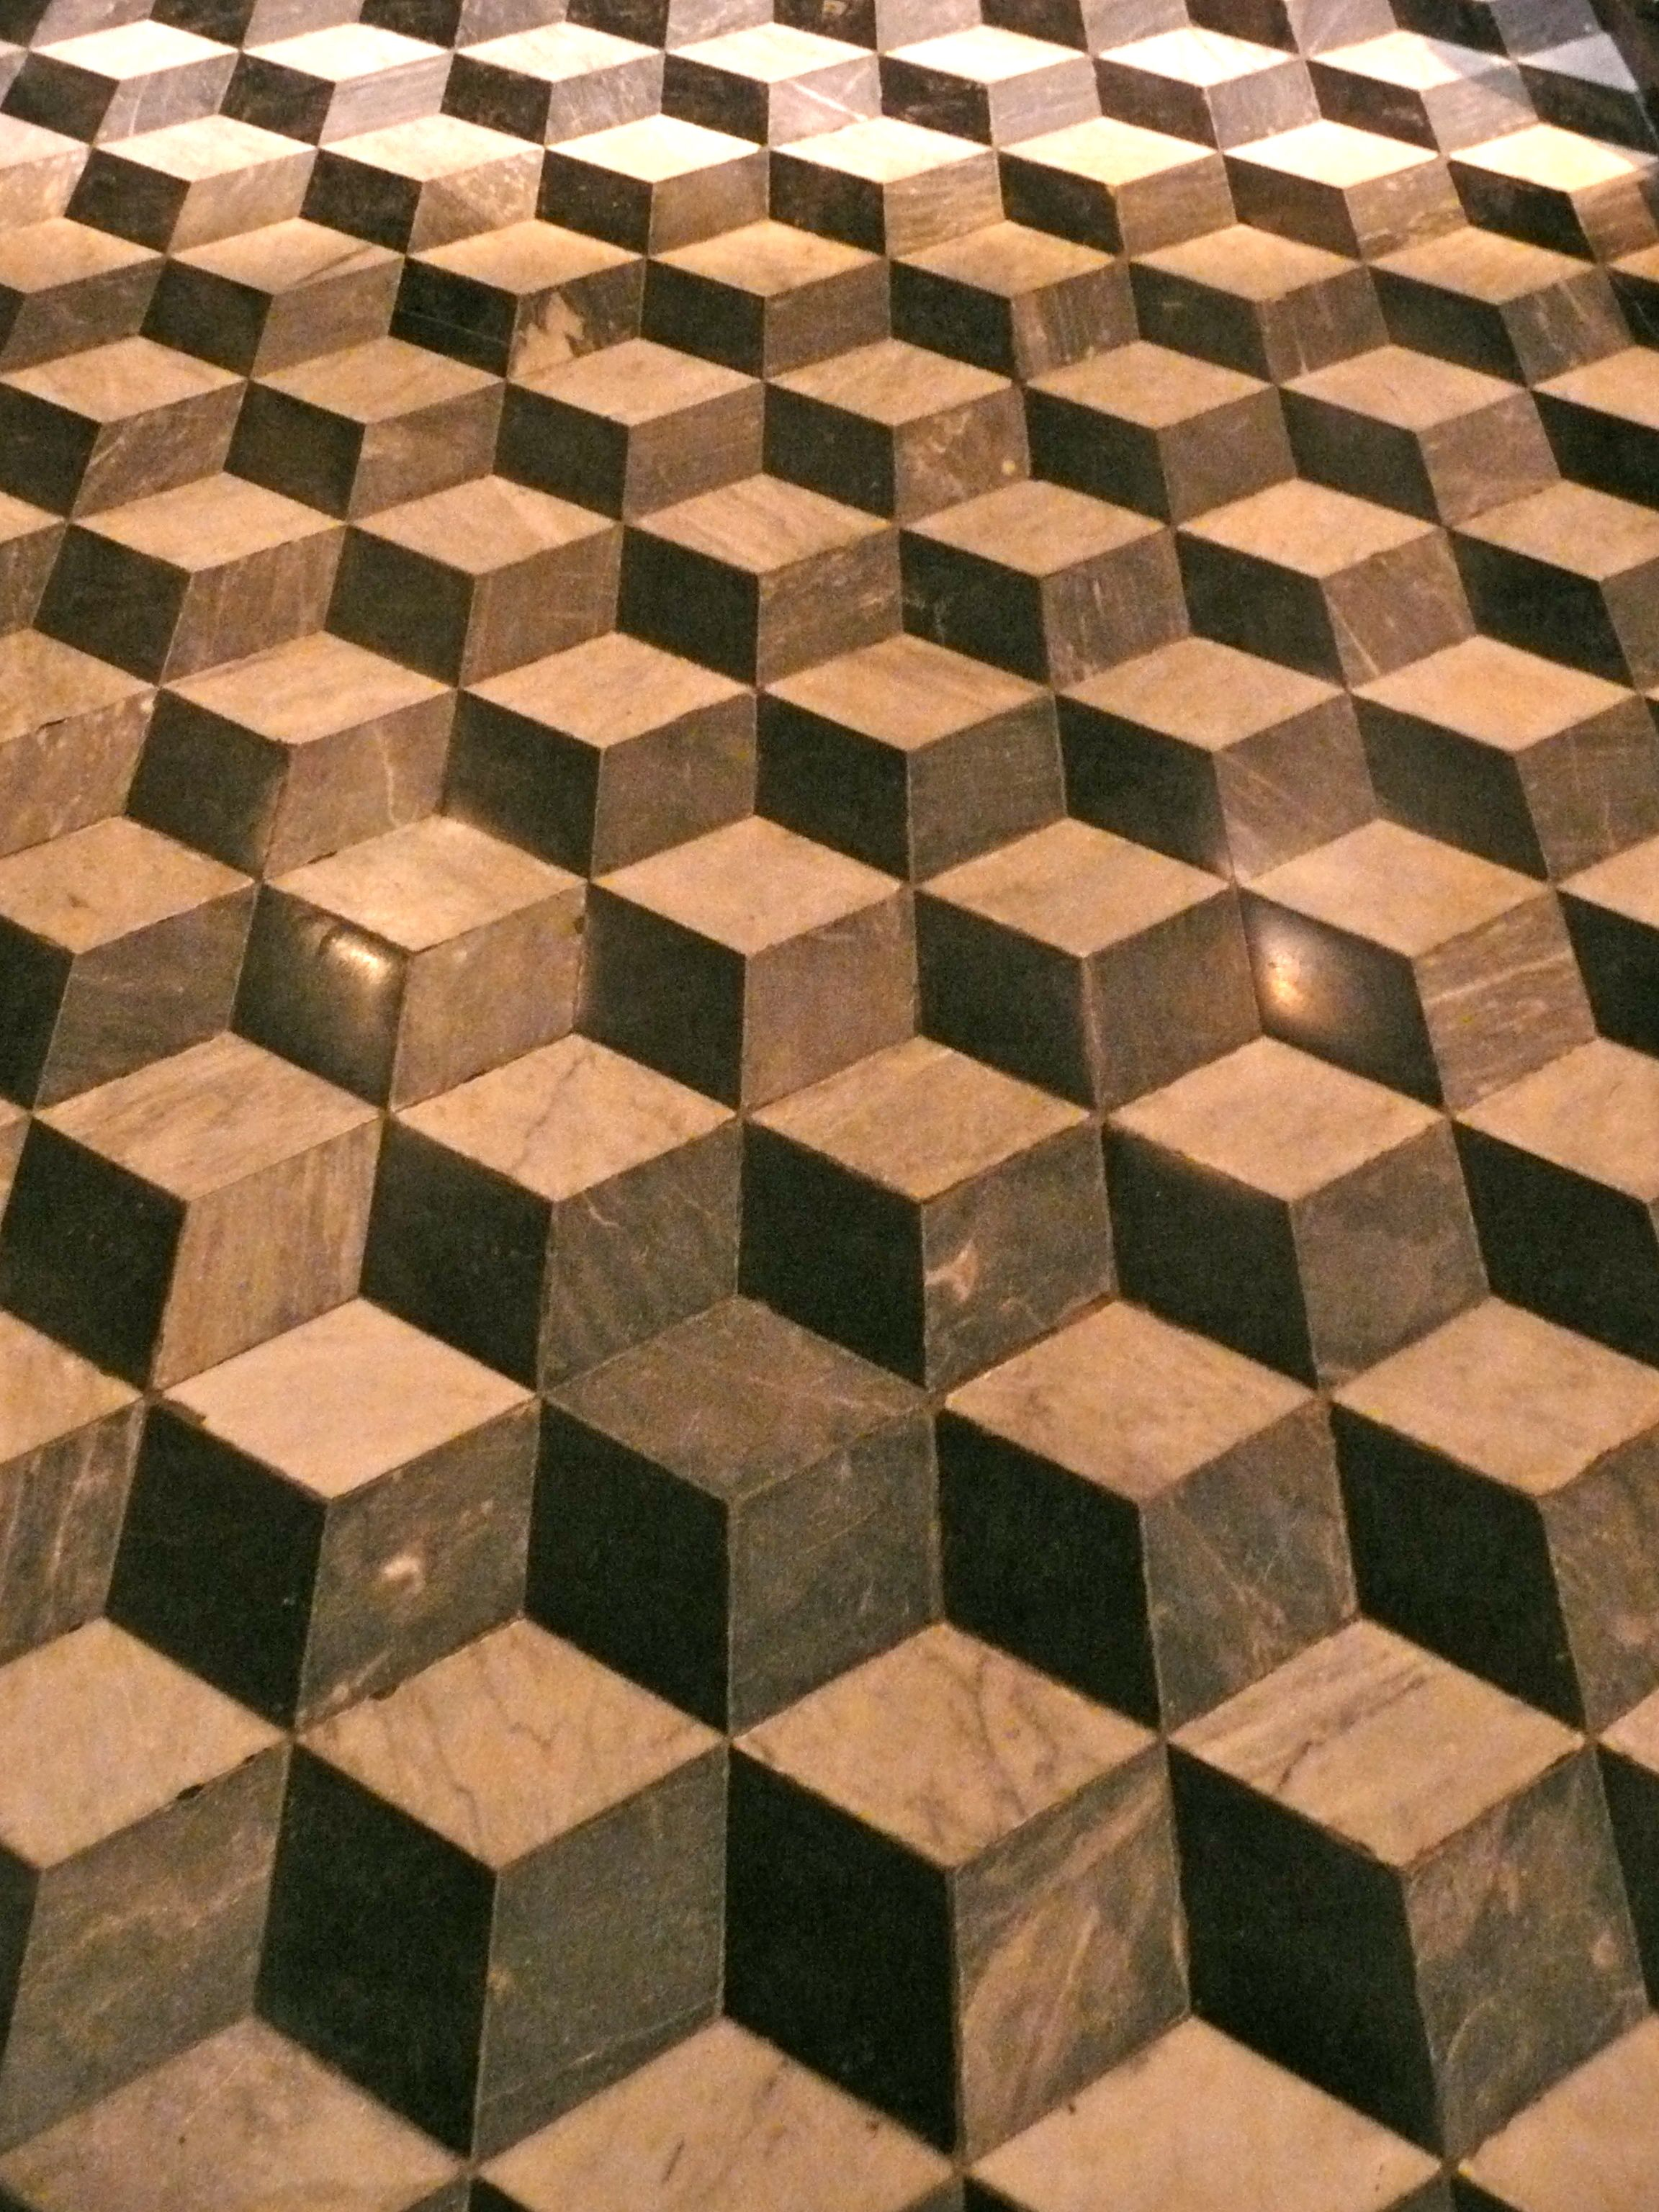 Salta, Argentina church floor